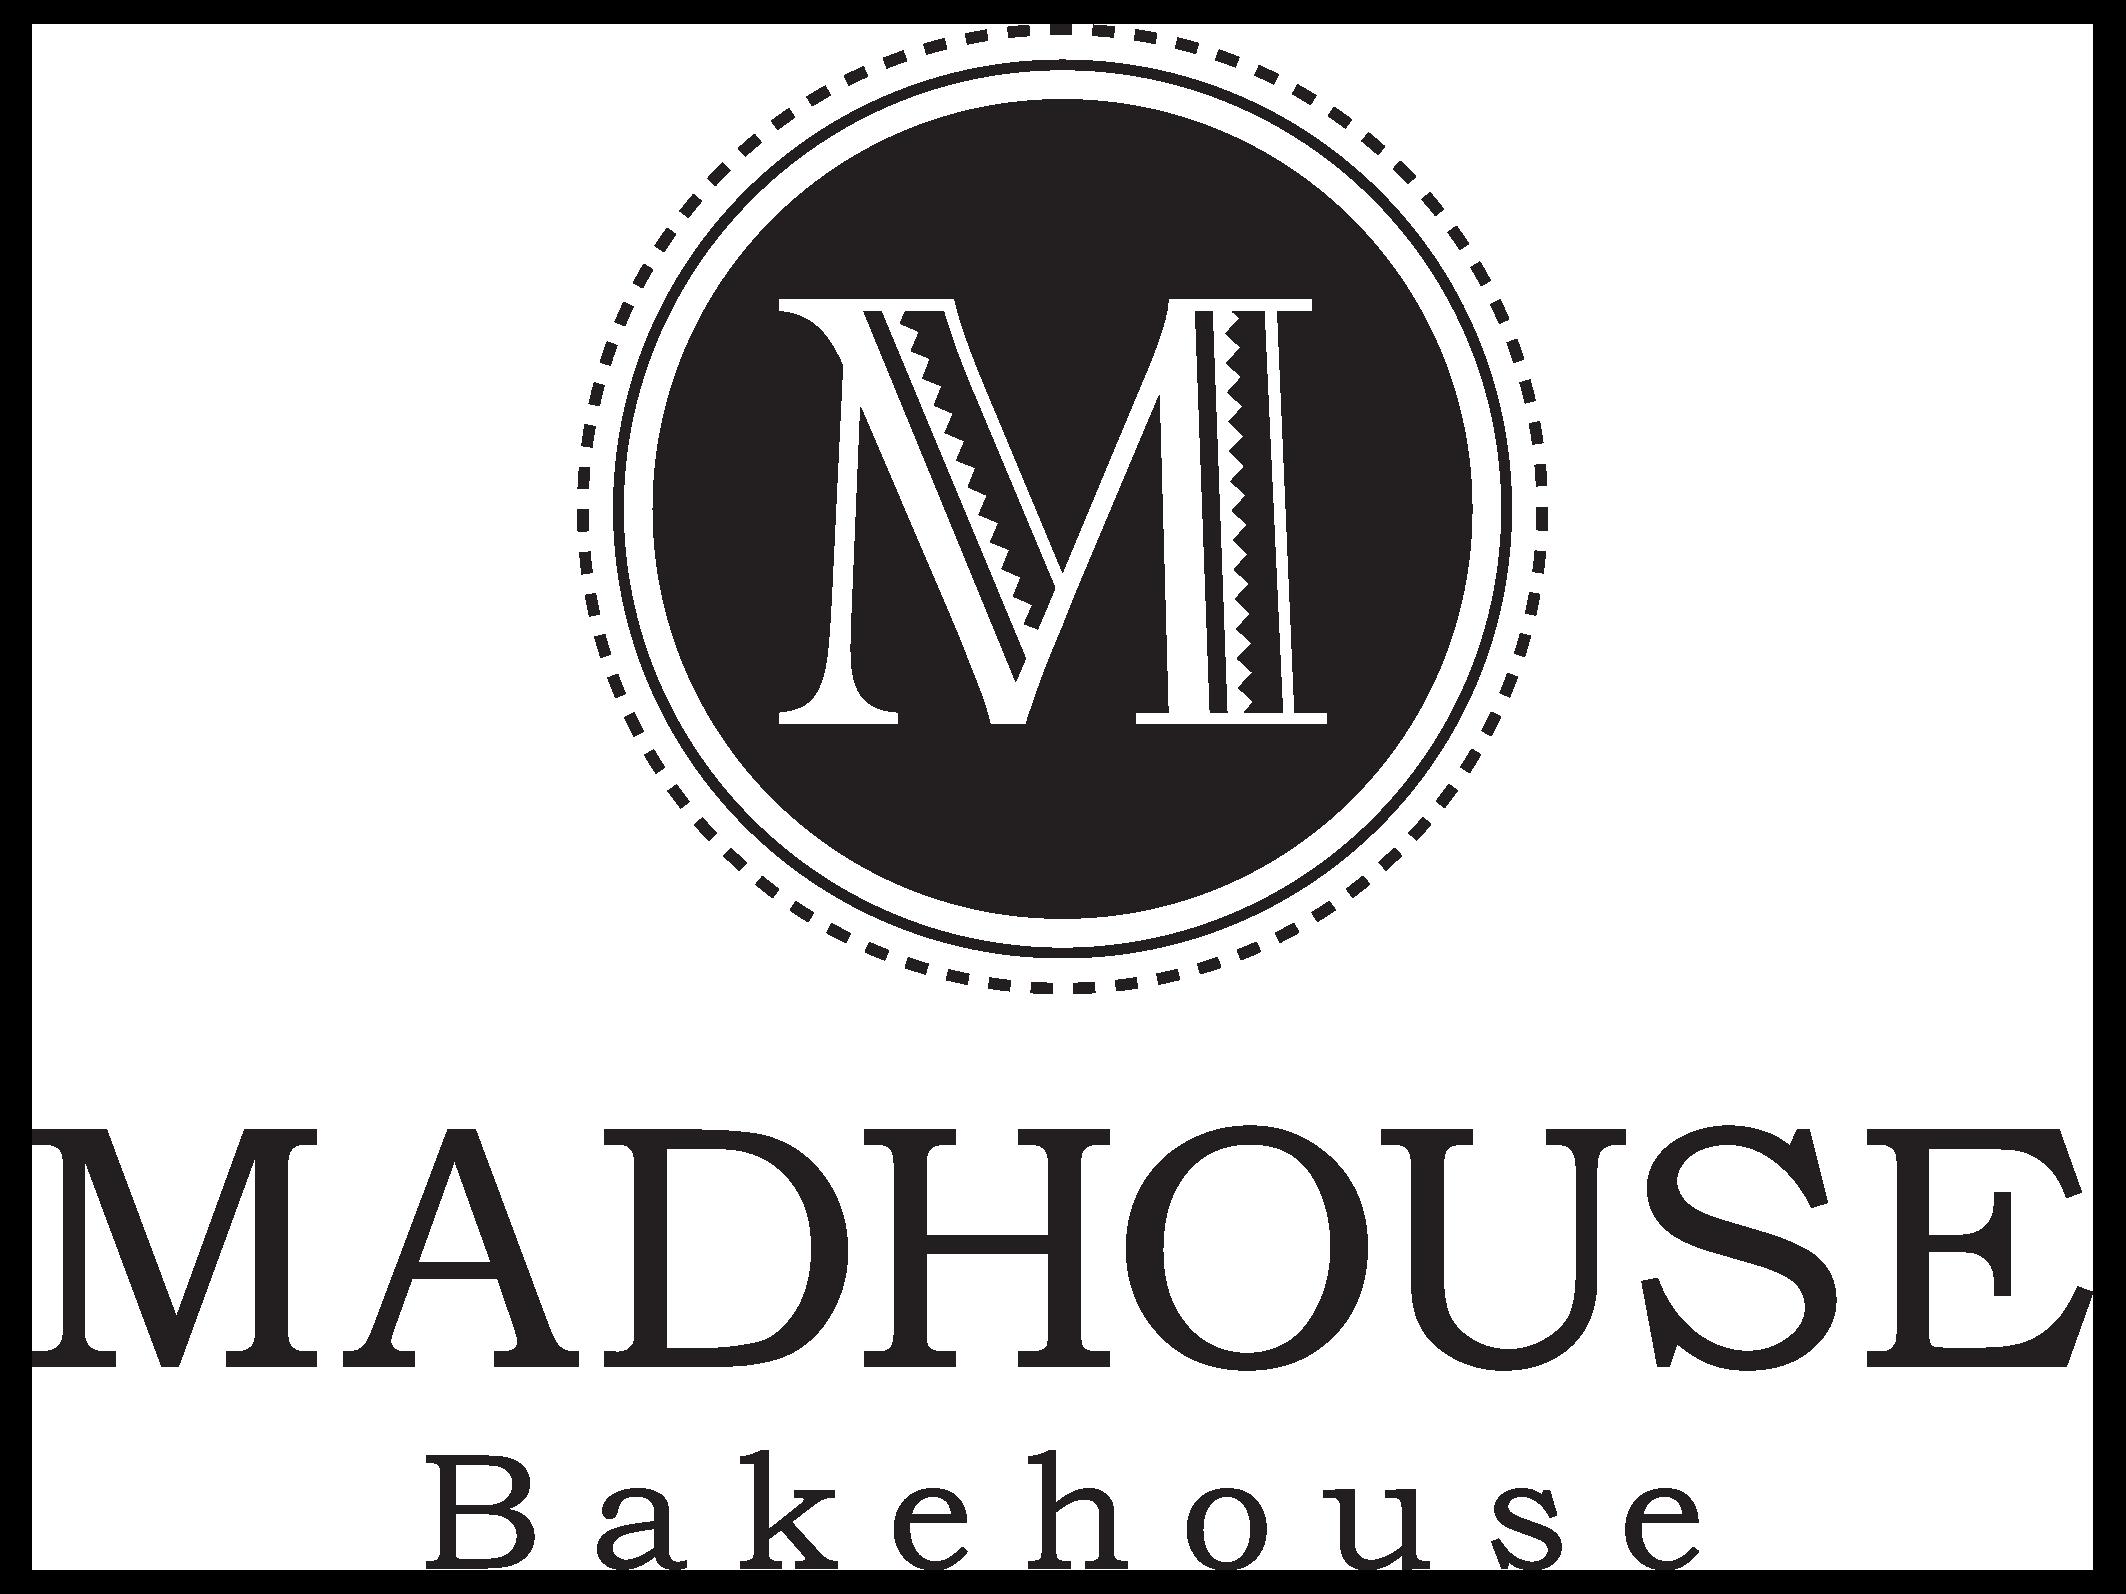 Madhouse Bakehouse